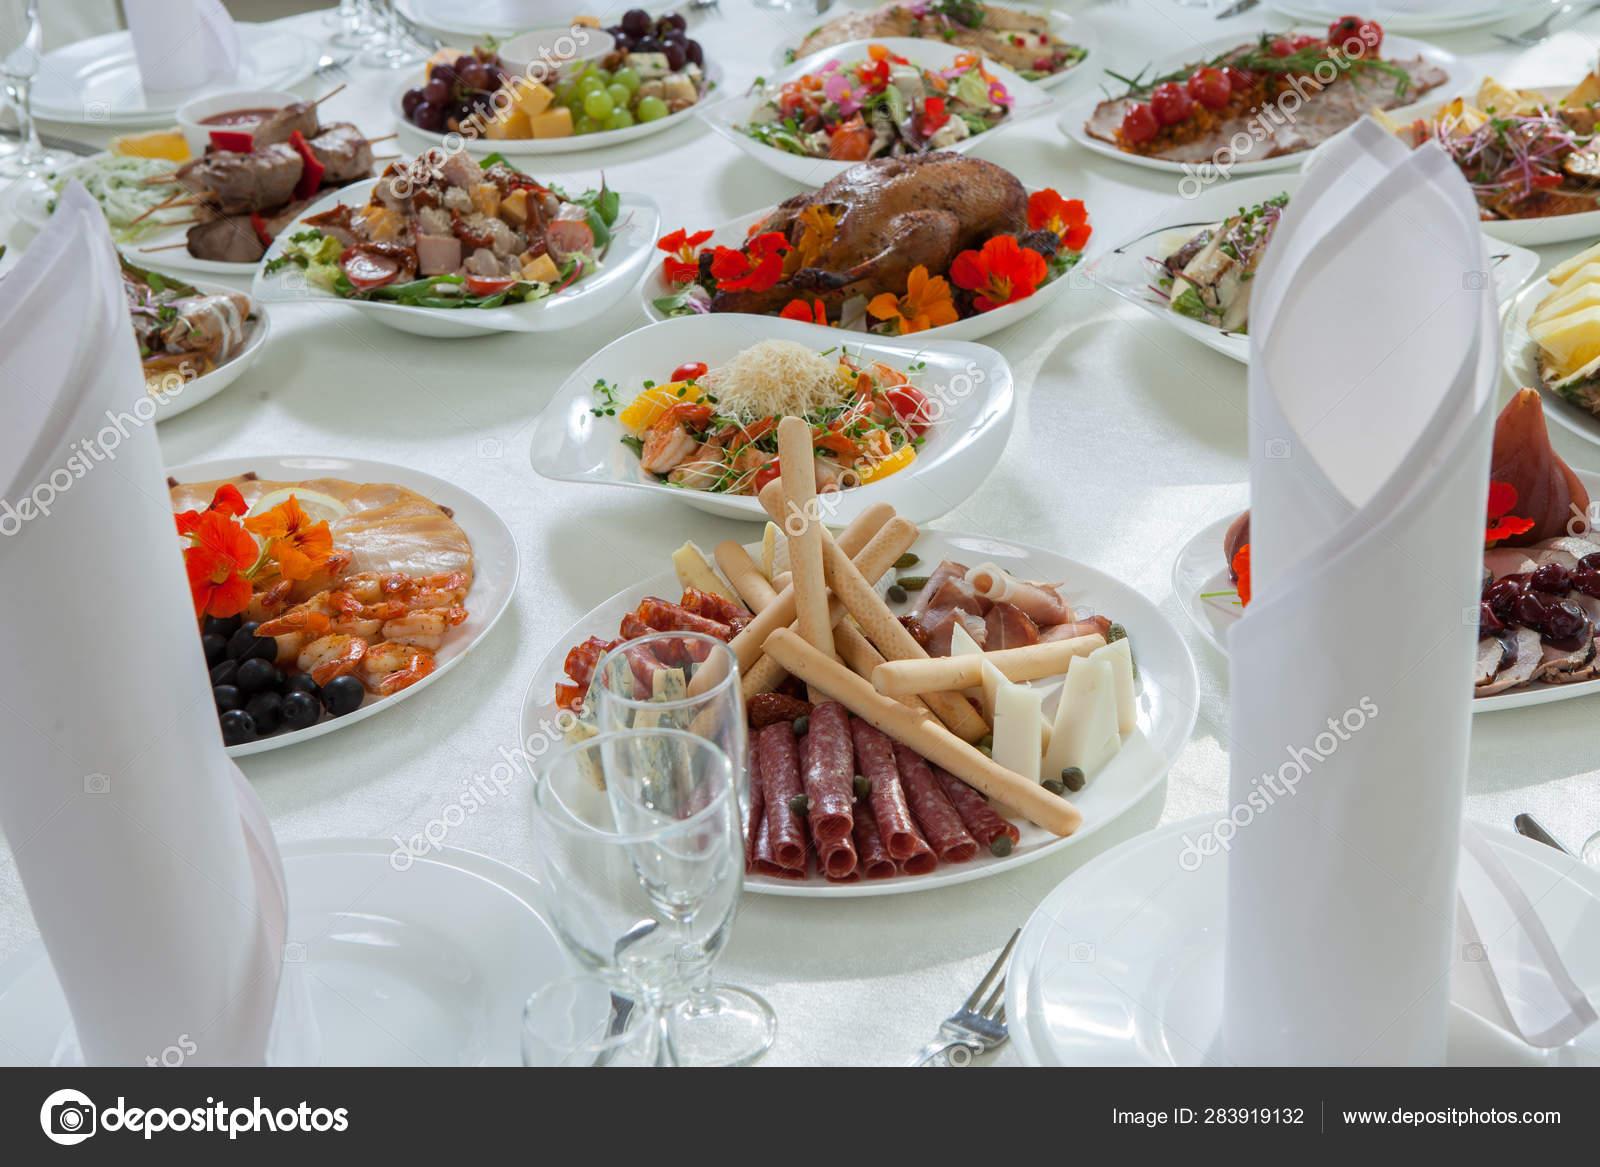 Beautiful Festive Table Served Wedding Celebration Dinner Home Restaurant Interior Stock Photo Image By C Romeovip 283919132